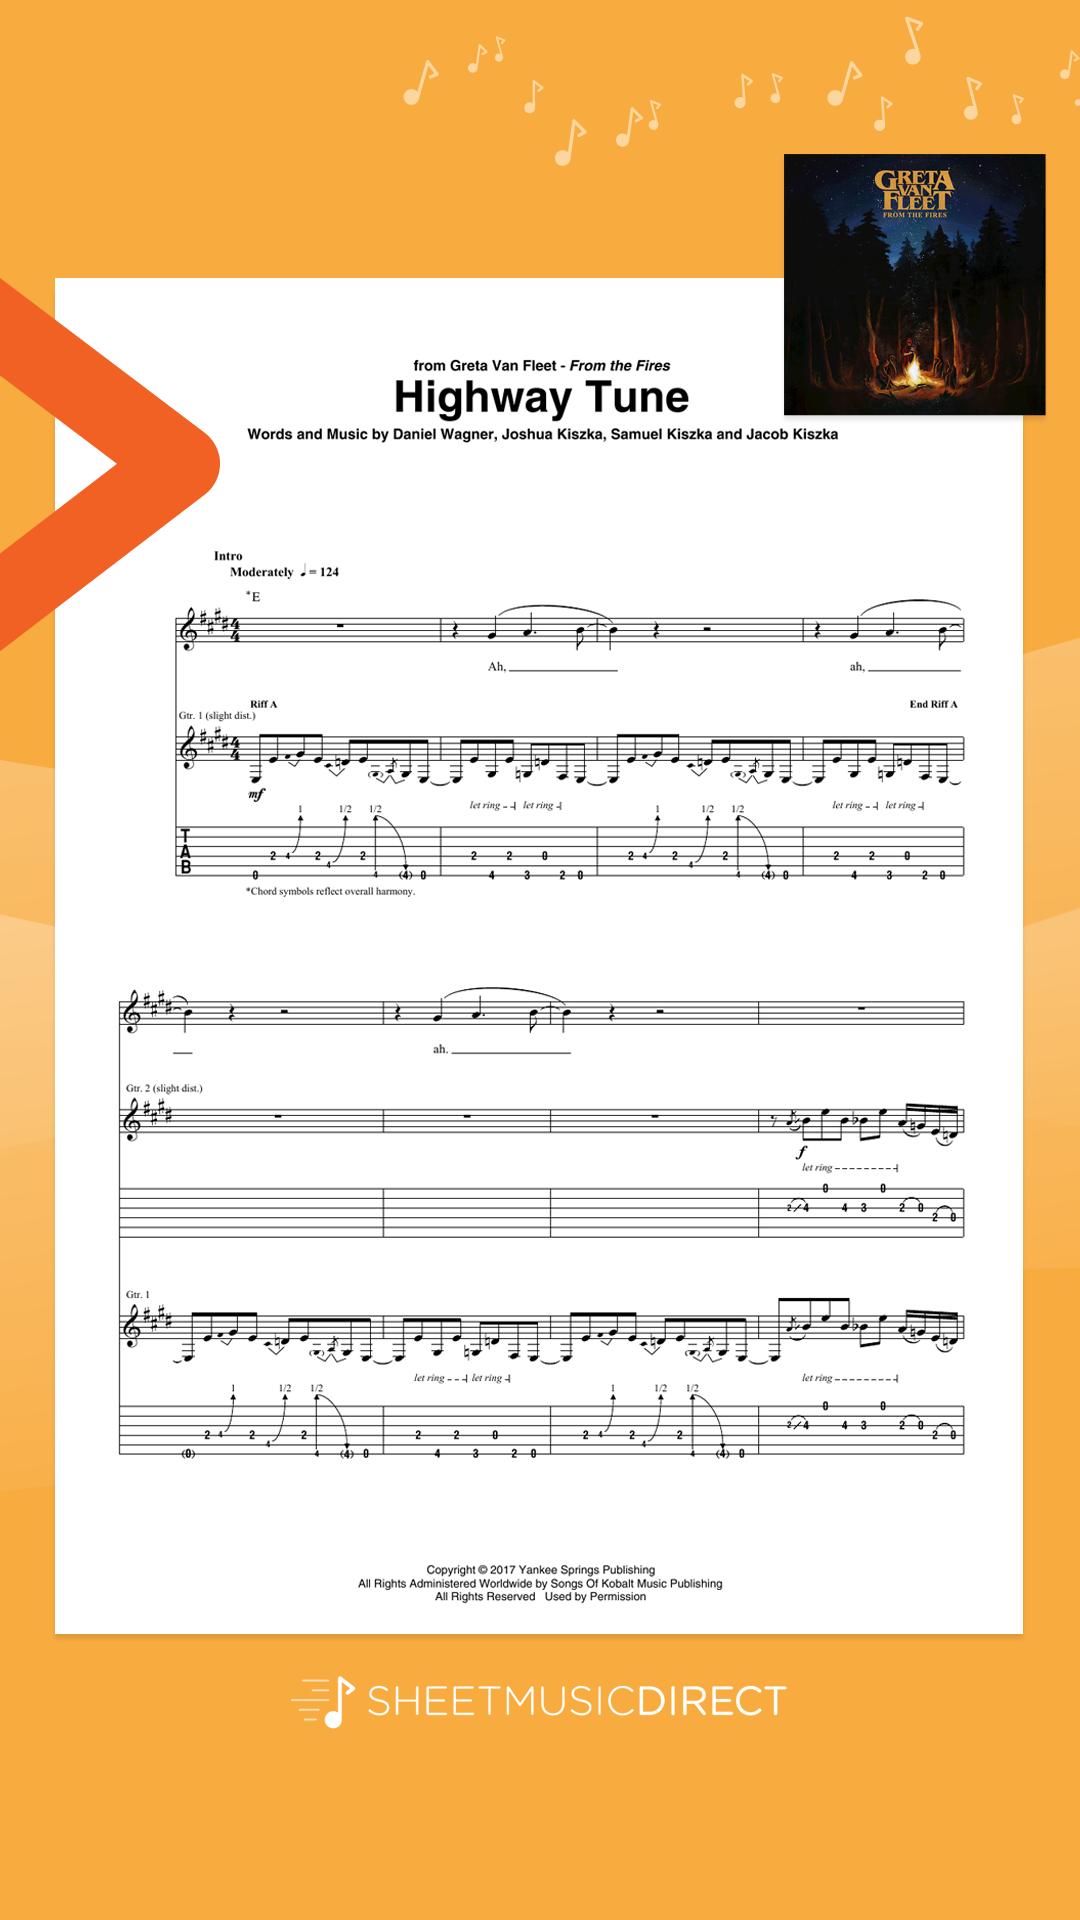 Download Highway Tune Sheet Music By Greta Van Fleet Arranged For Guitar Tab Sheet Music Direct Online Sheet Music Digital Sheet Music